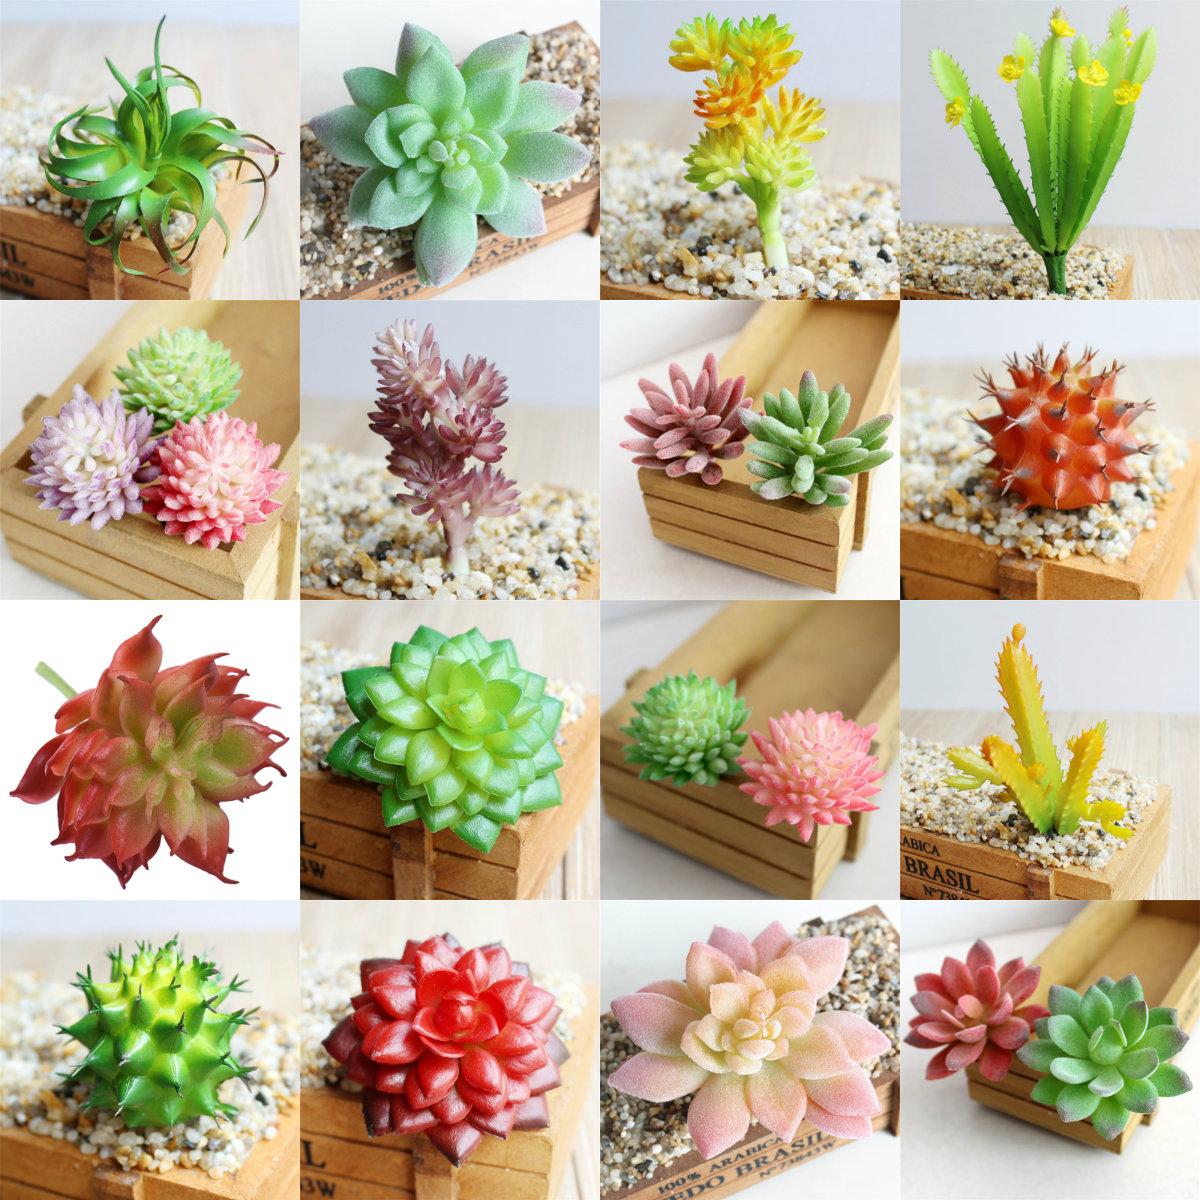 Garden Miniature Fake Cactus Diy